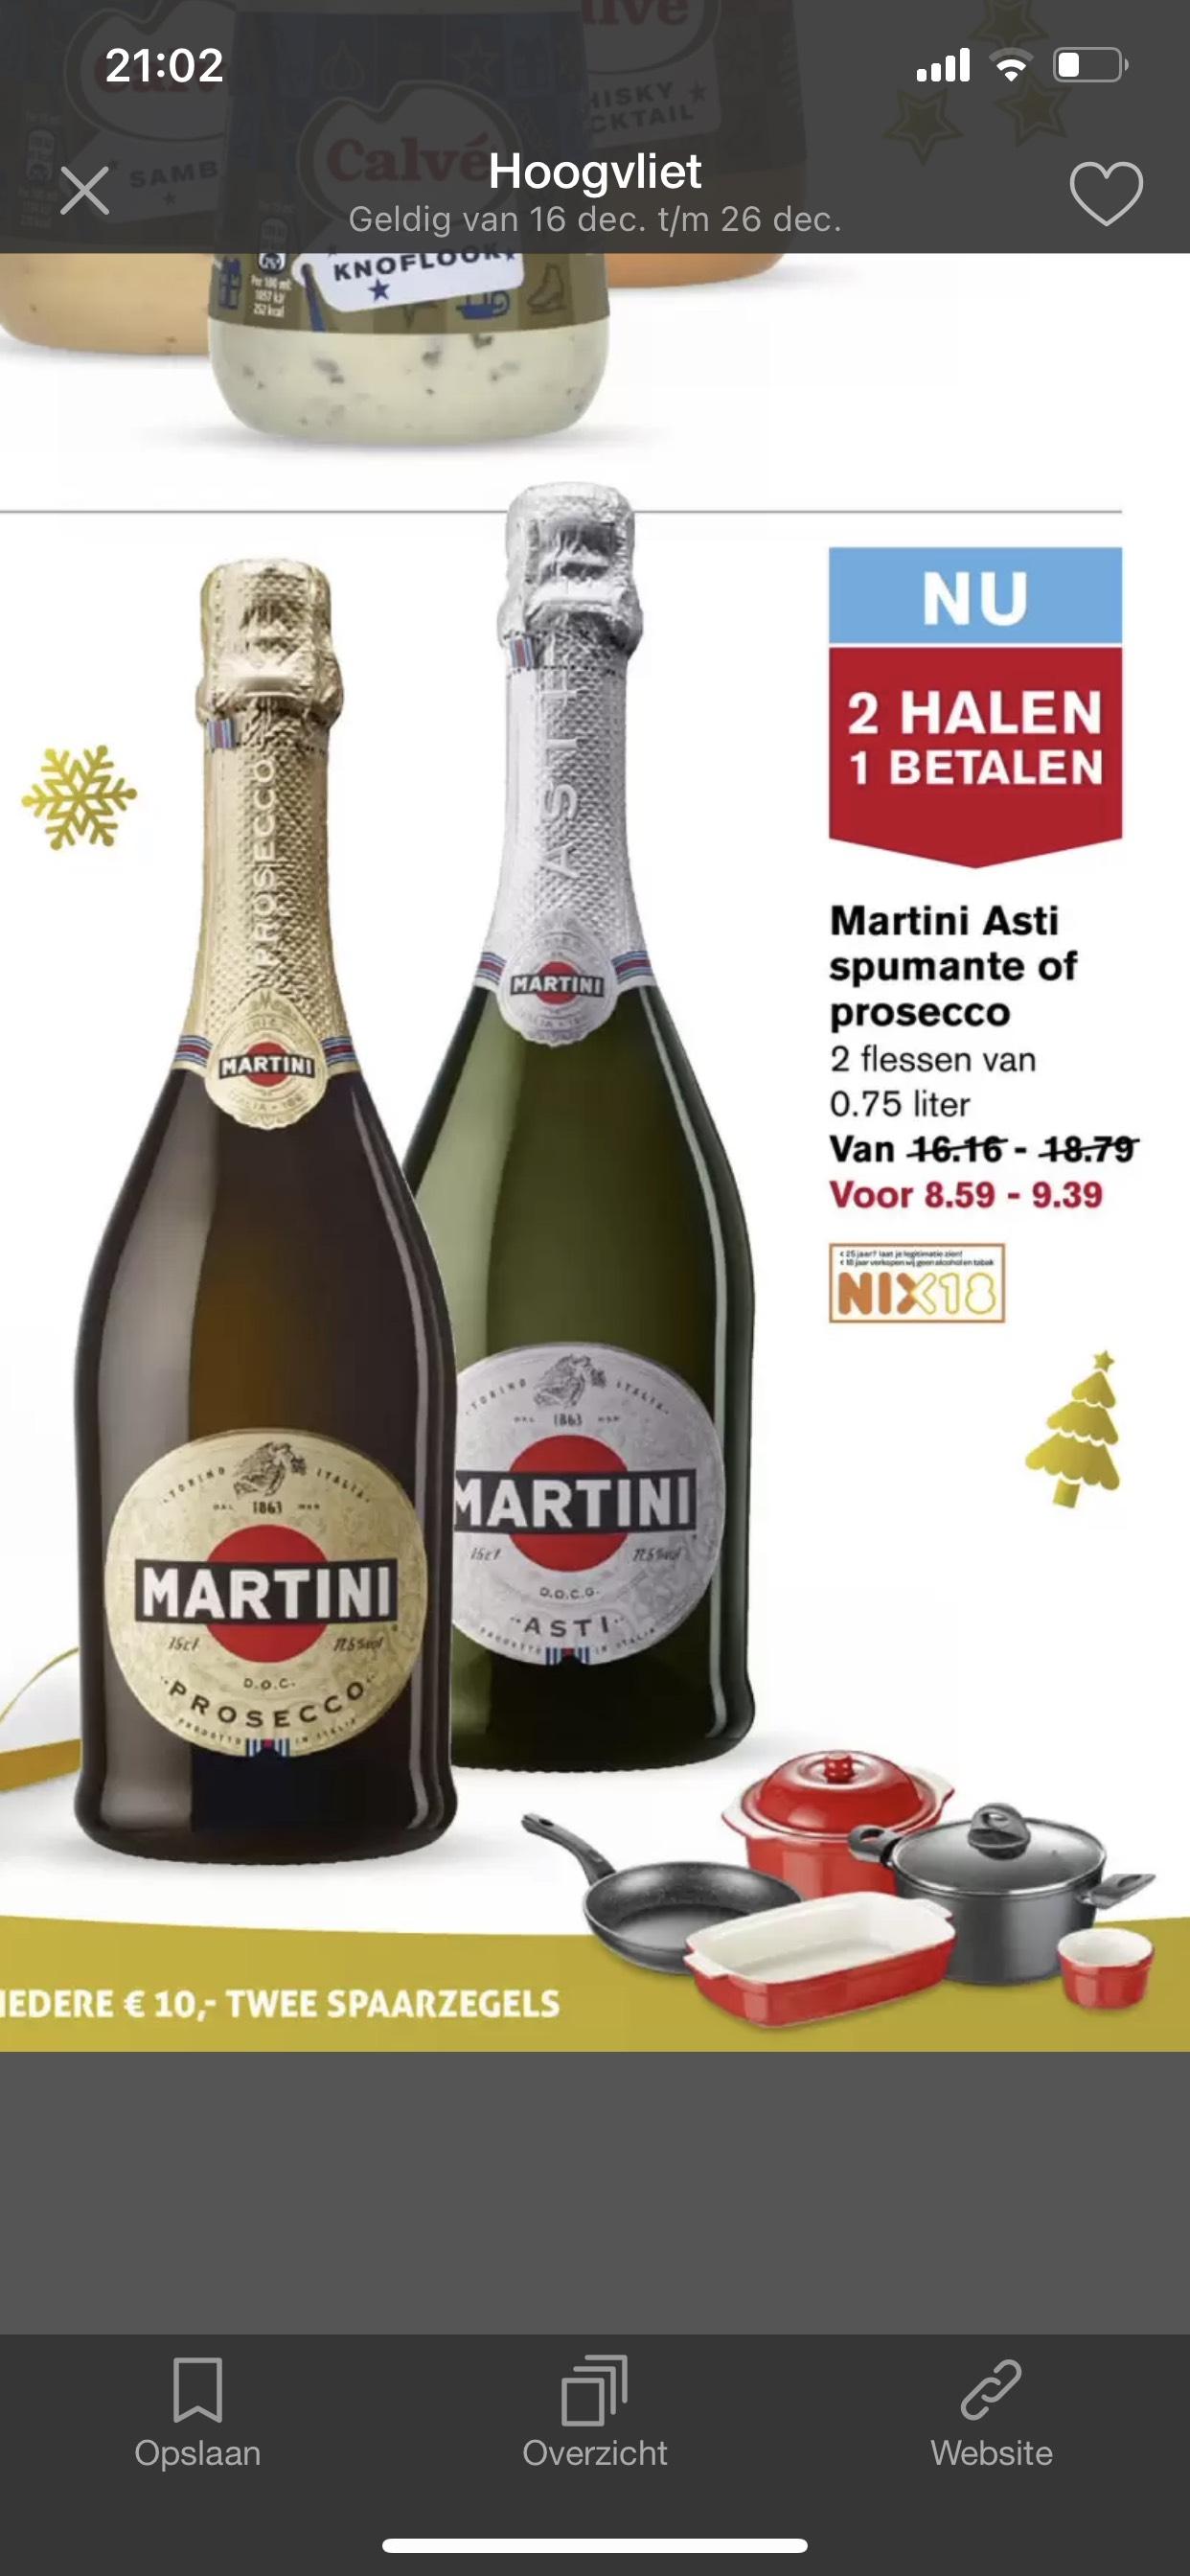 2 halen 1 betalen Martini